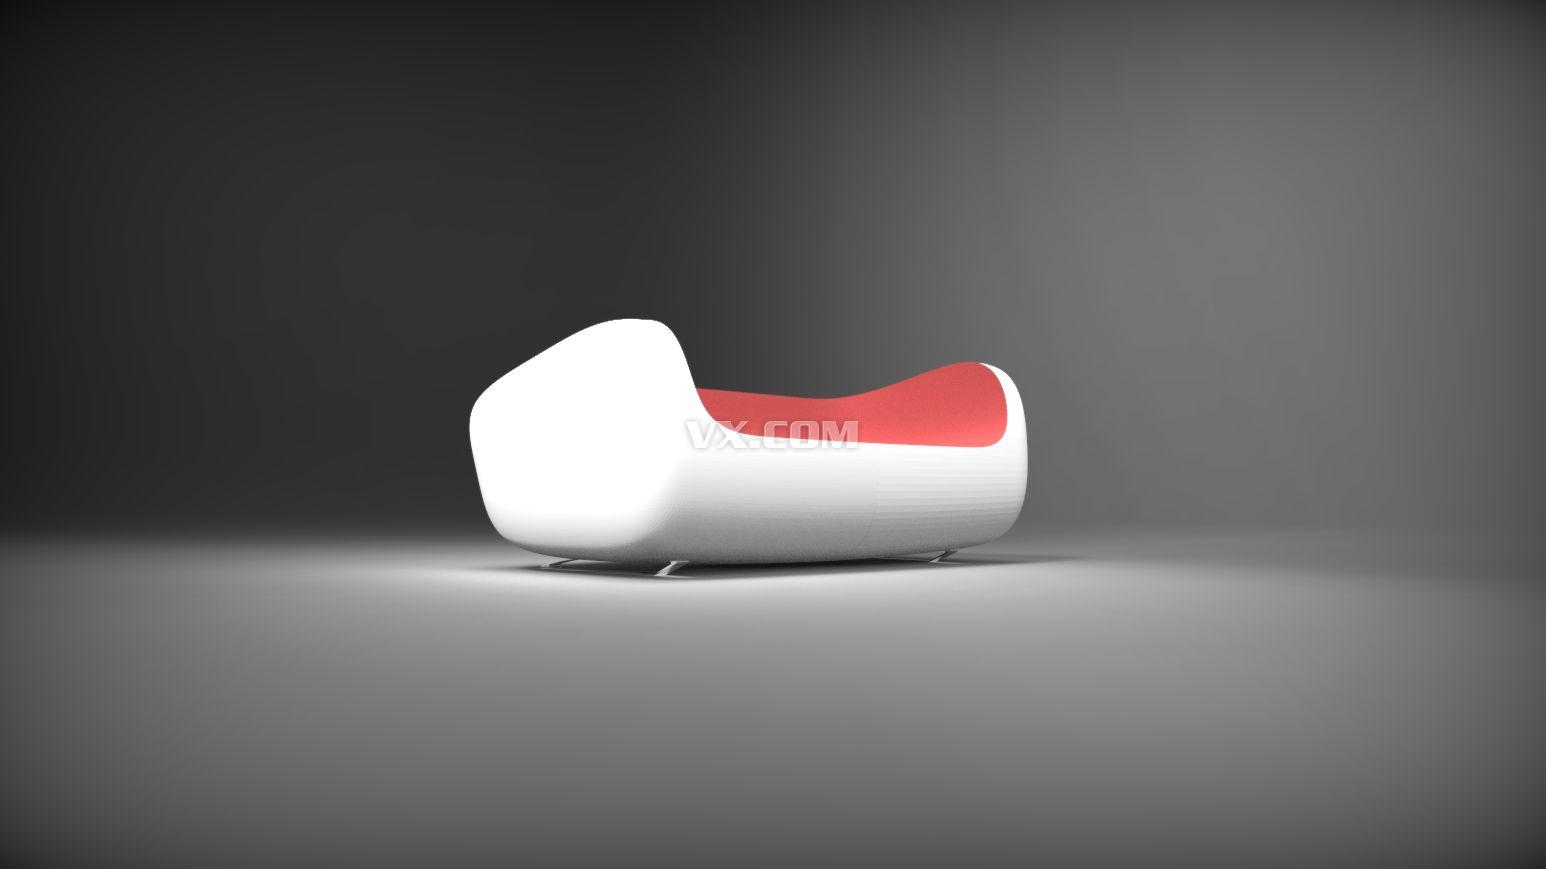 3dmax 沙发_3dsmax_家具_3d模型_图纸下载_微小网